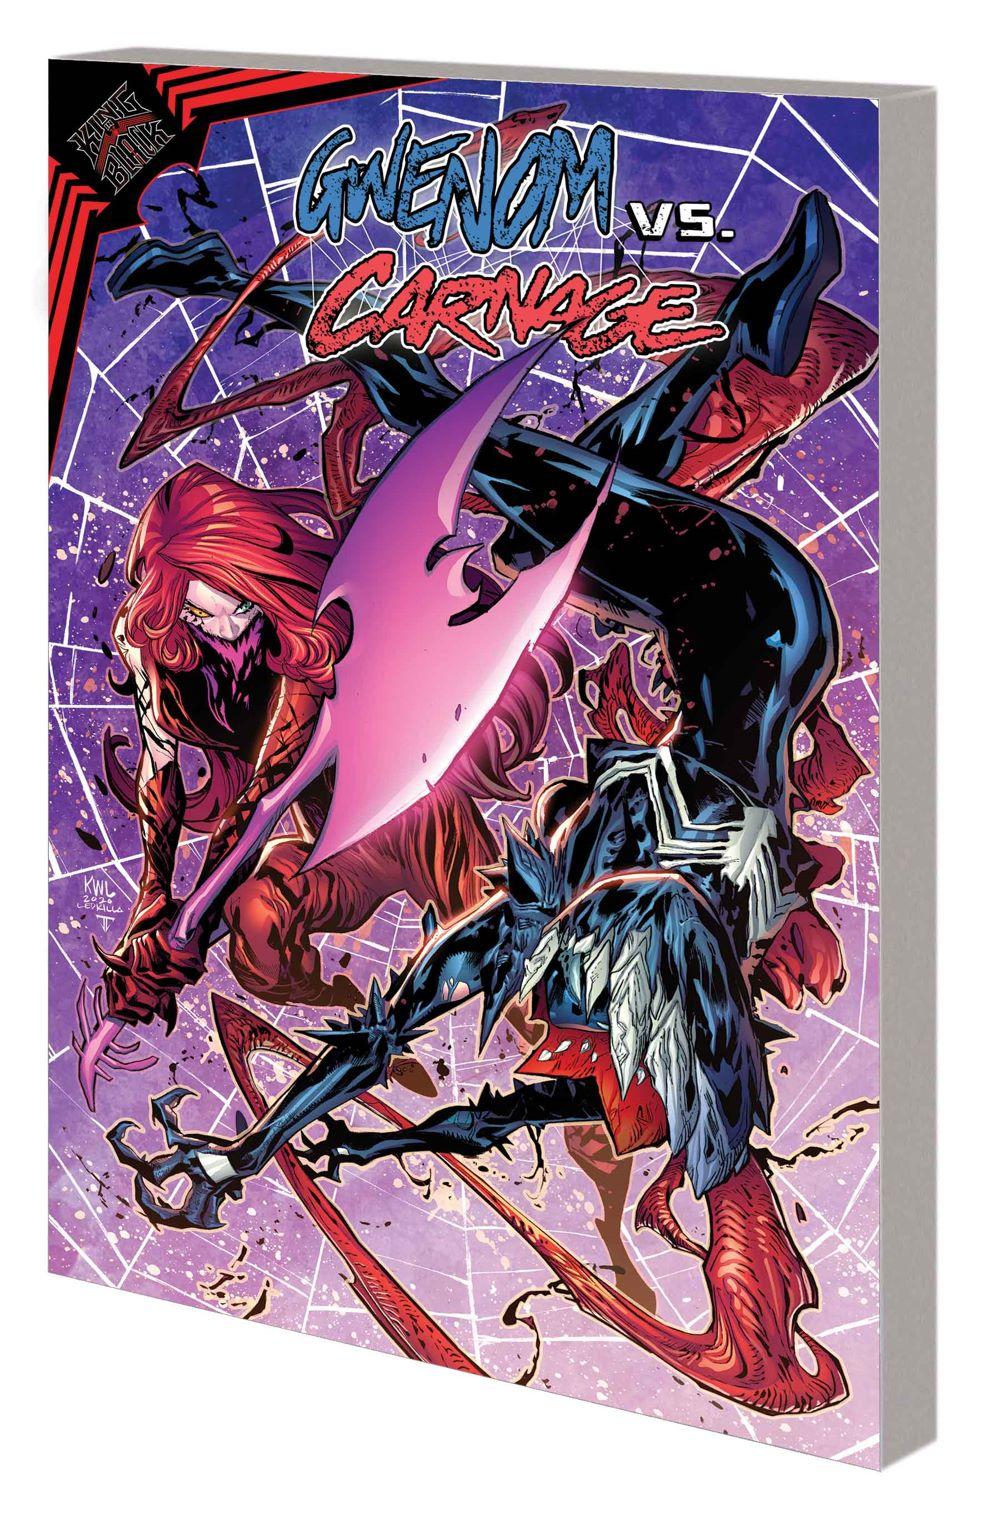 KIB_GWENOMVSCARNAGE_TPB Marvel Comics June 2021 Solicitations